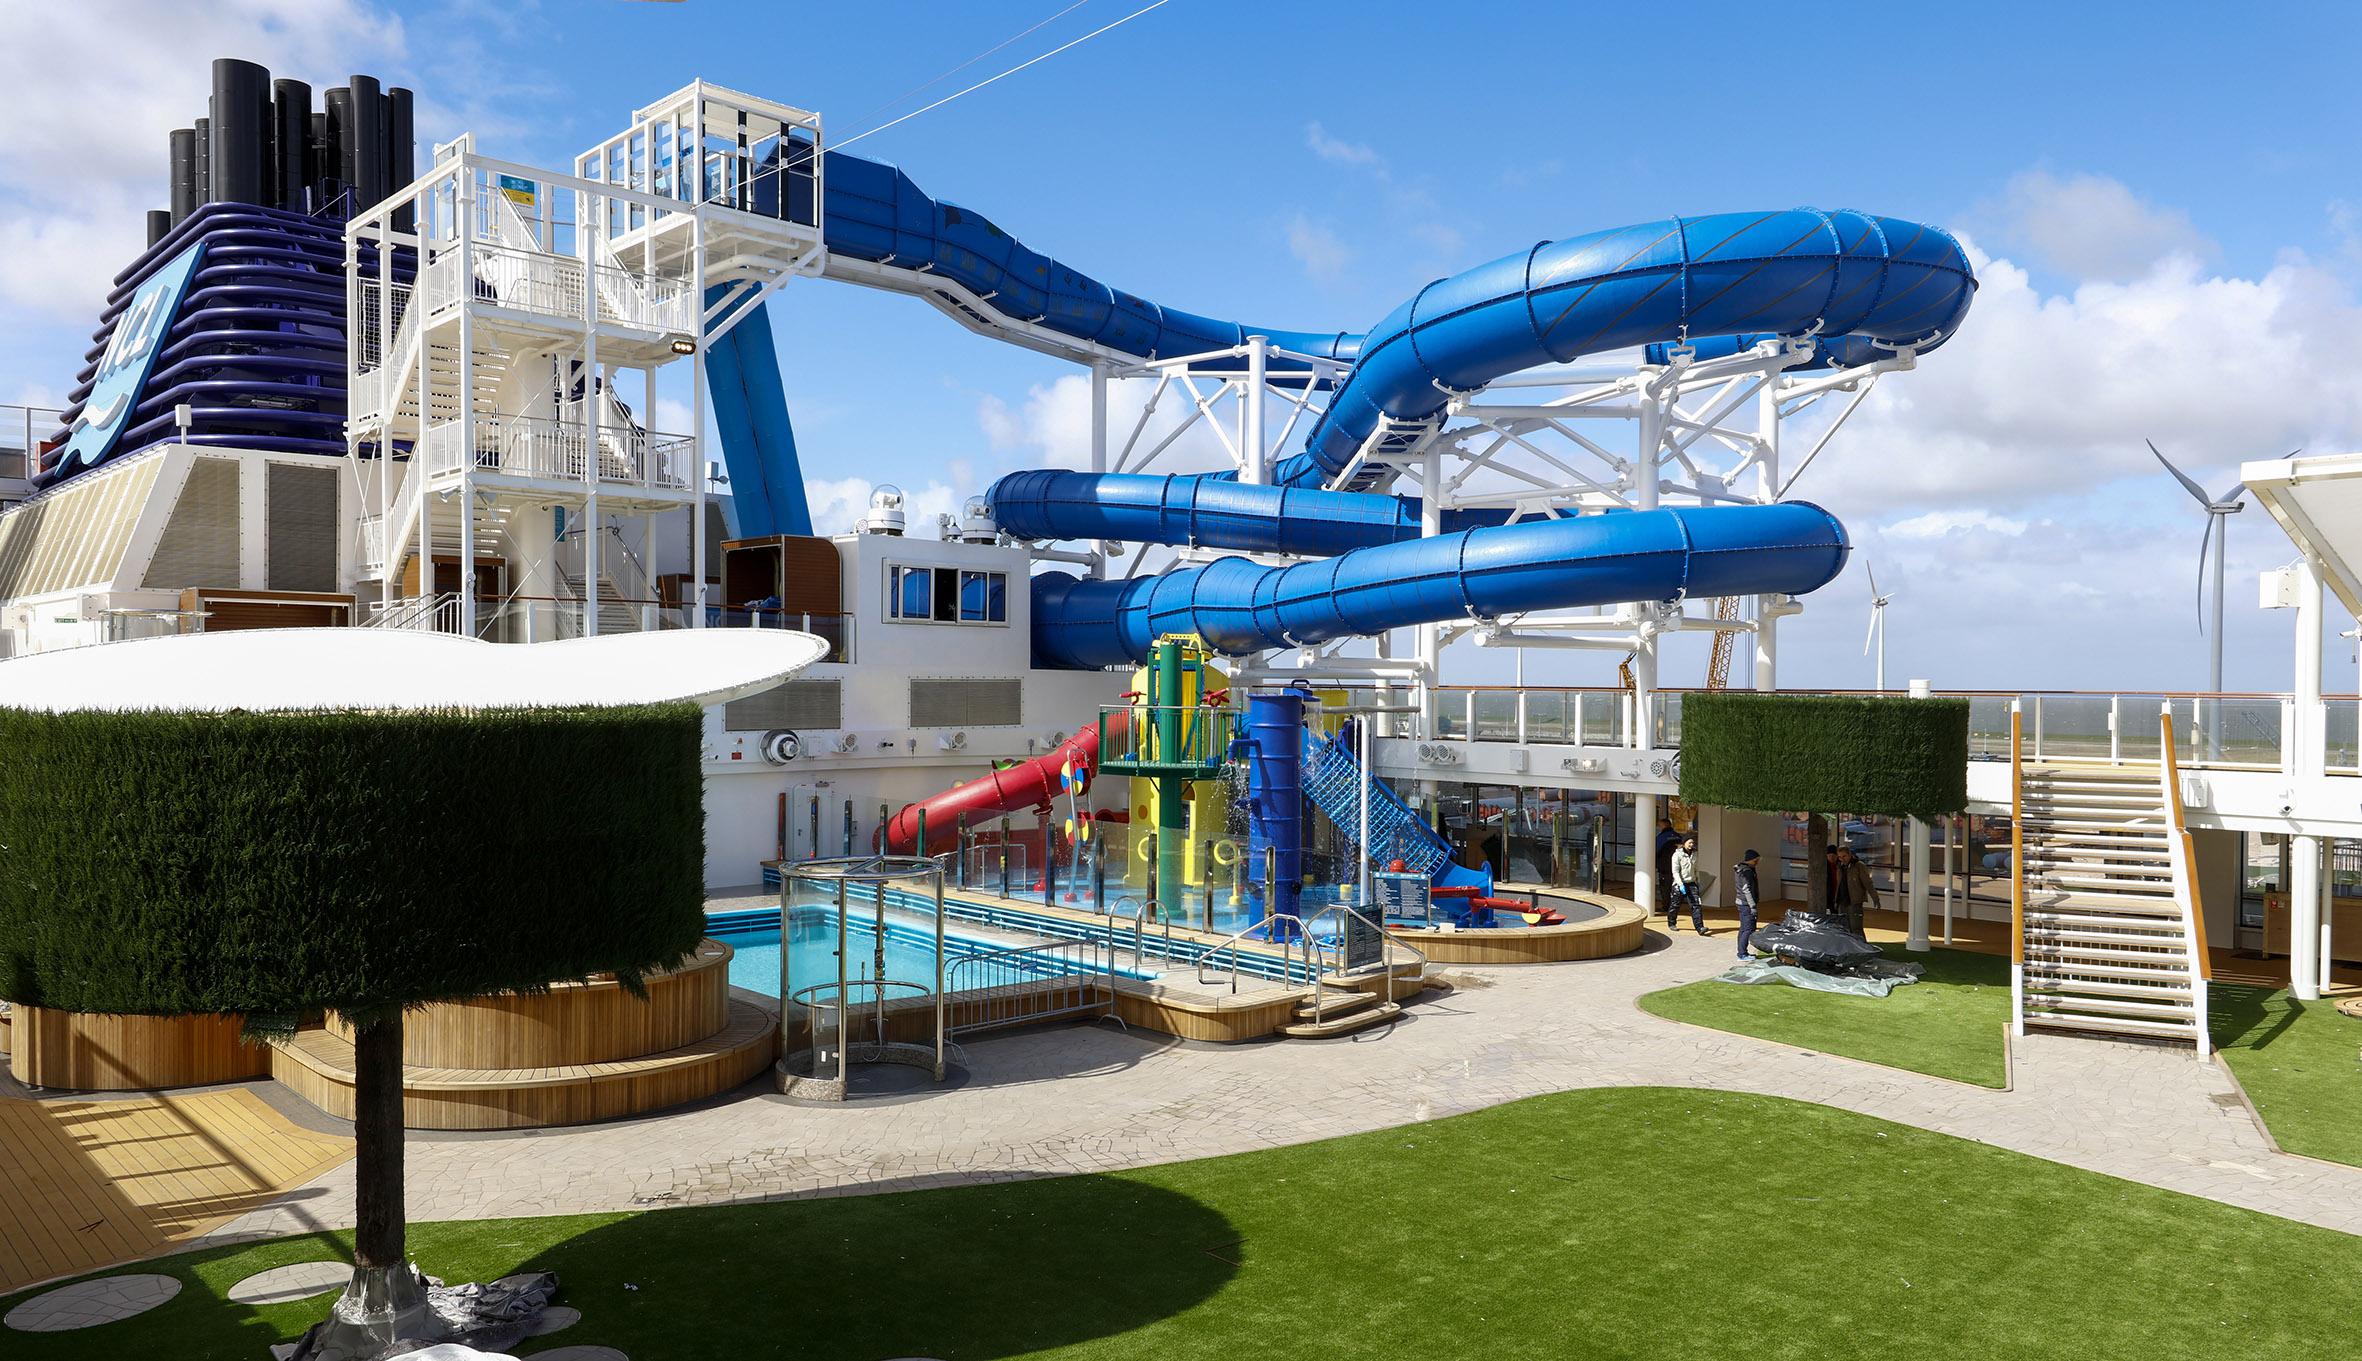 Credit: Ingrid Fiebak-Kremer/Norwegian Cruise Line